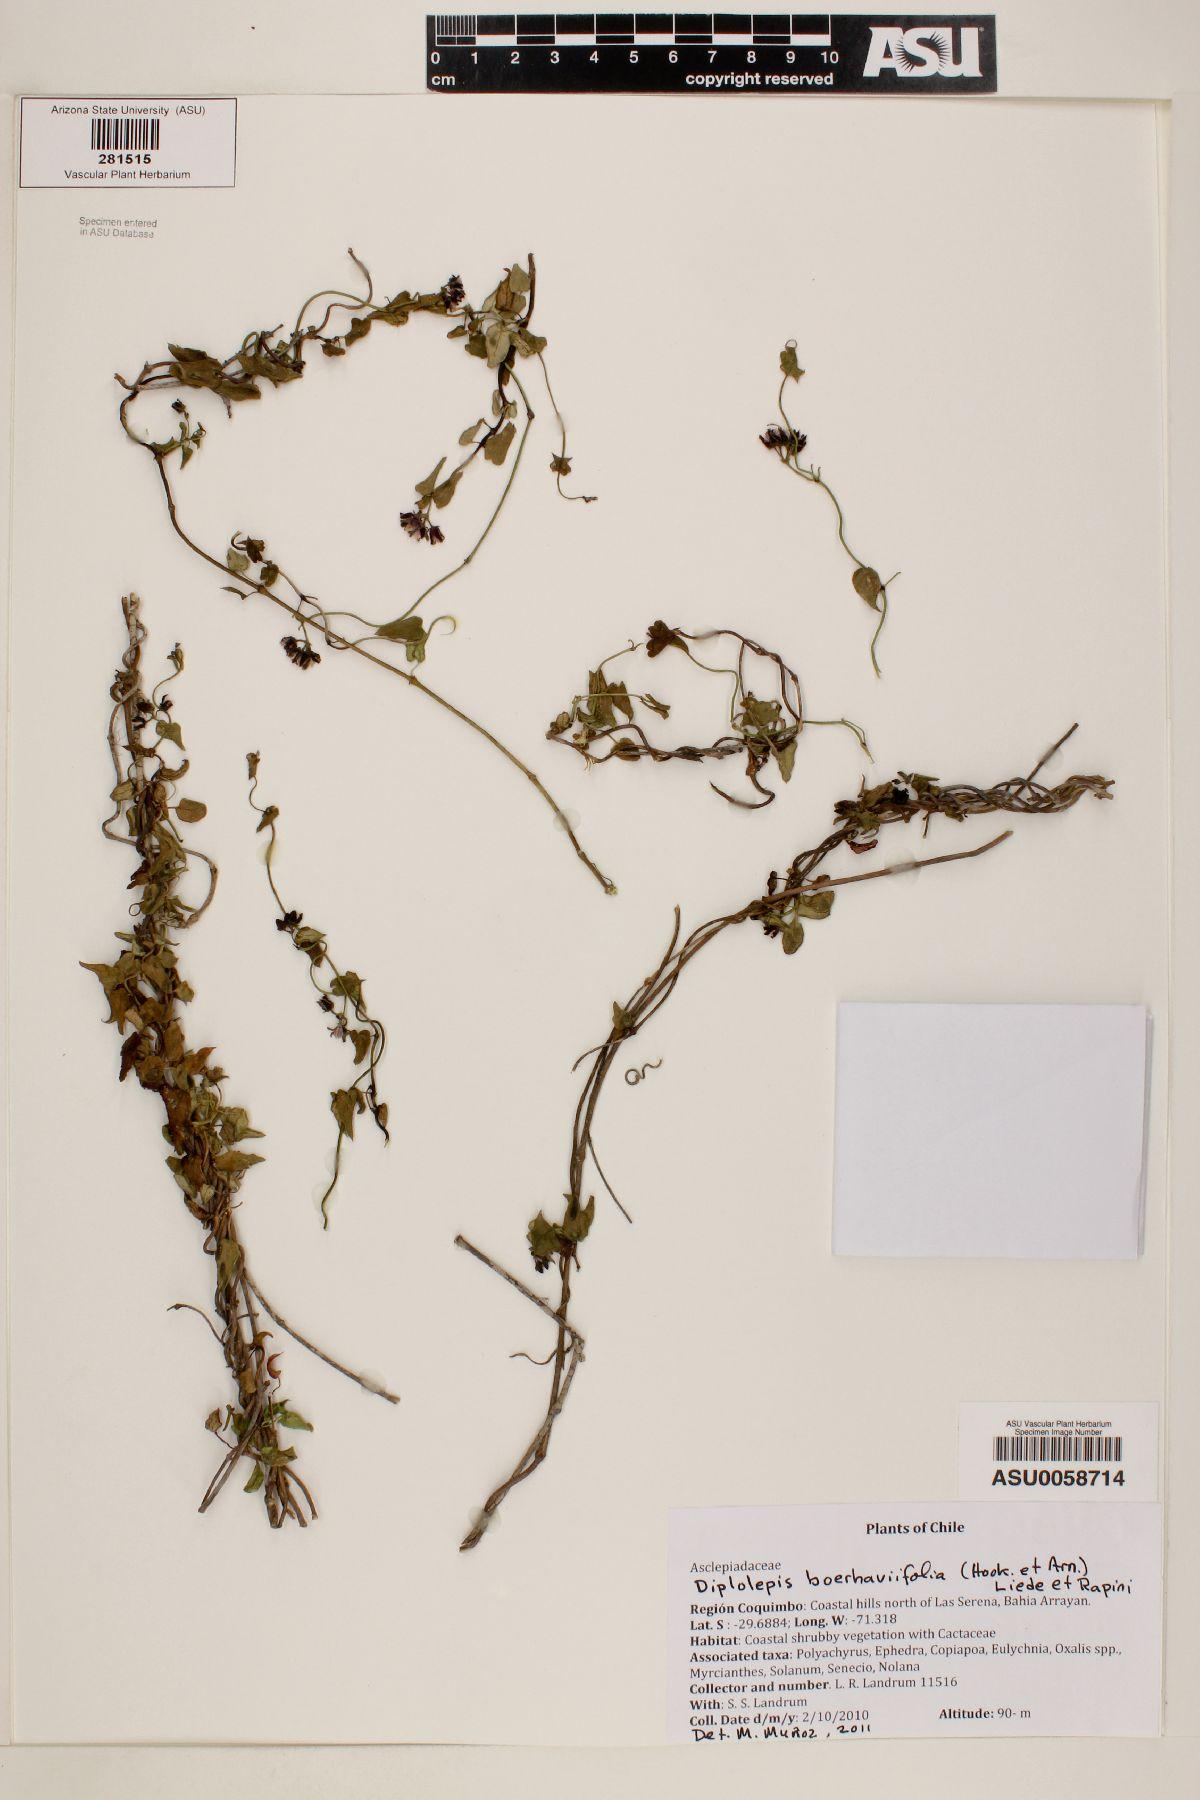 Diplolepis boerhaviifolia image